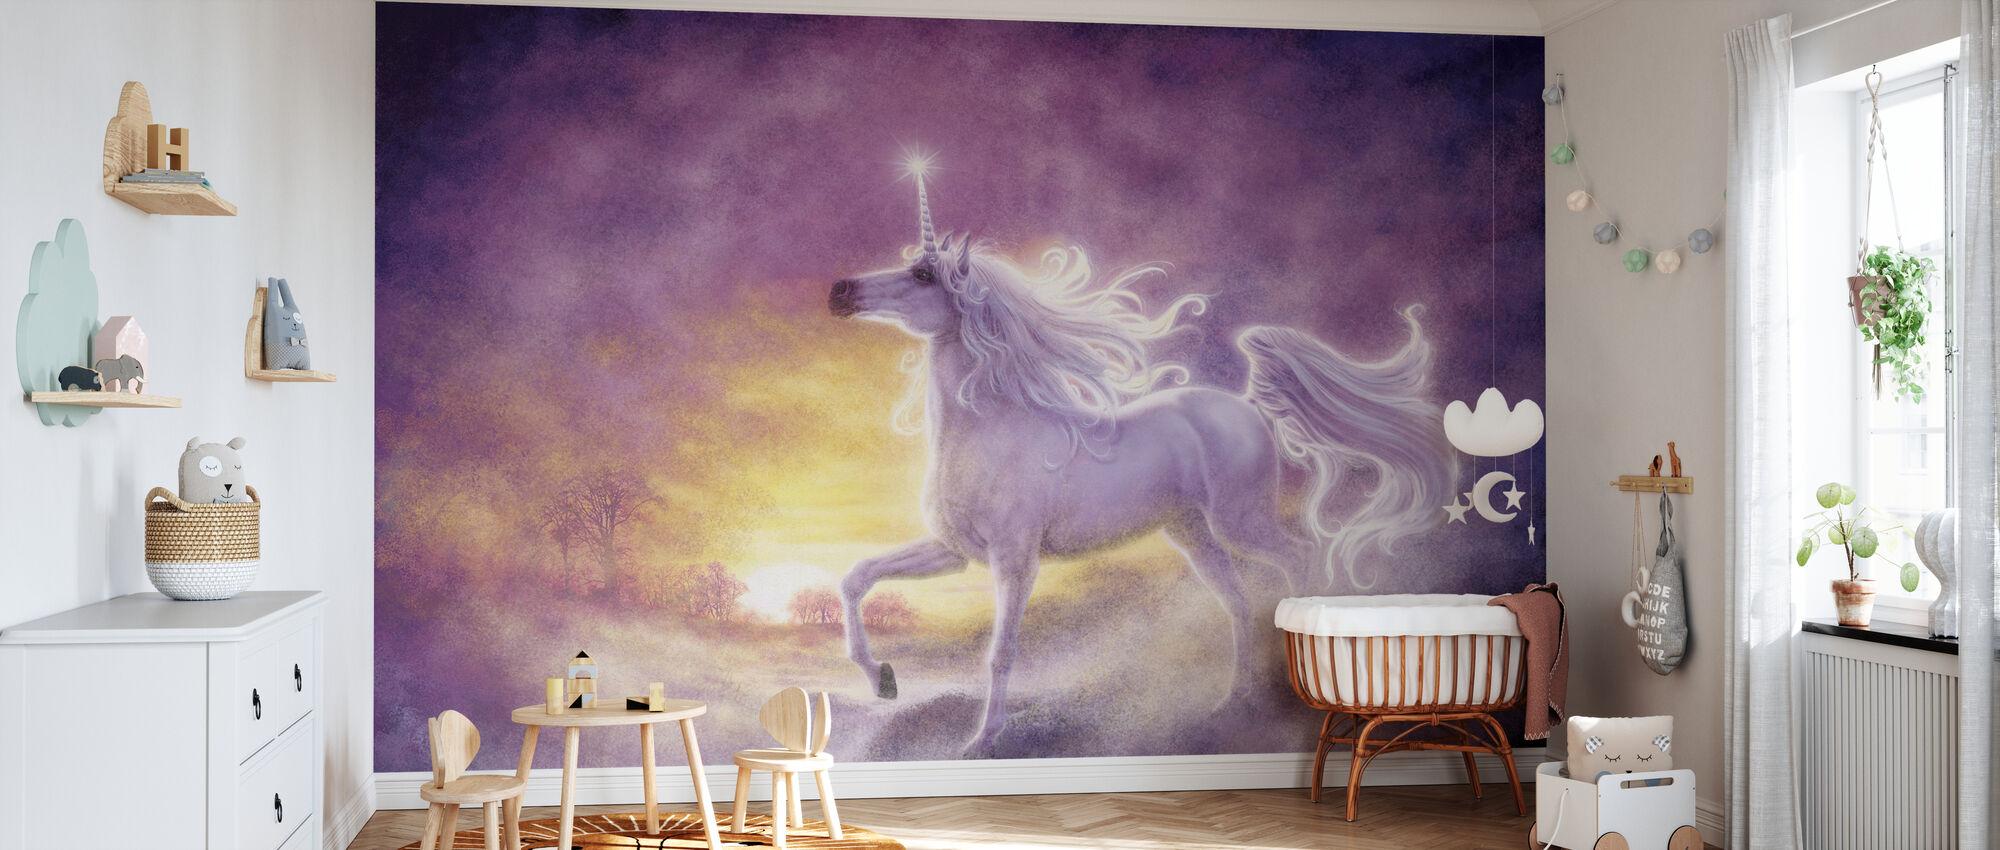 Enchantment - Wallpaper - Nursery